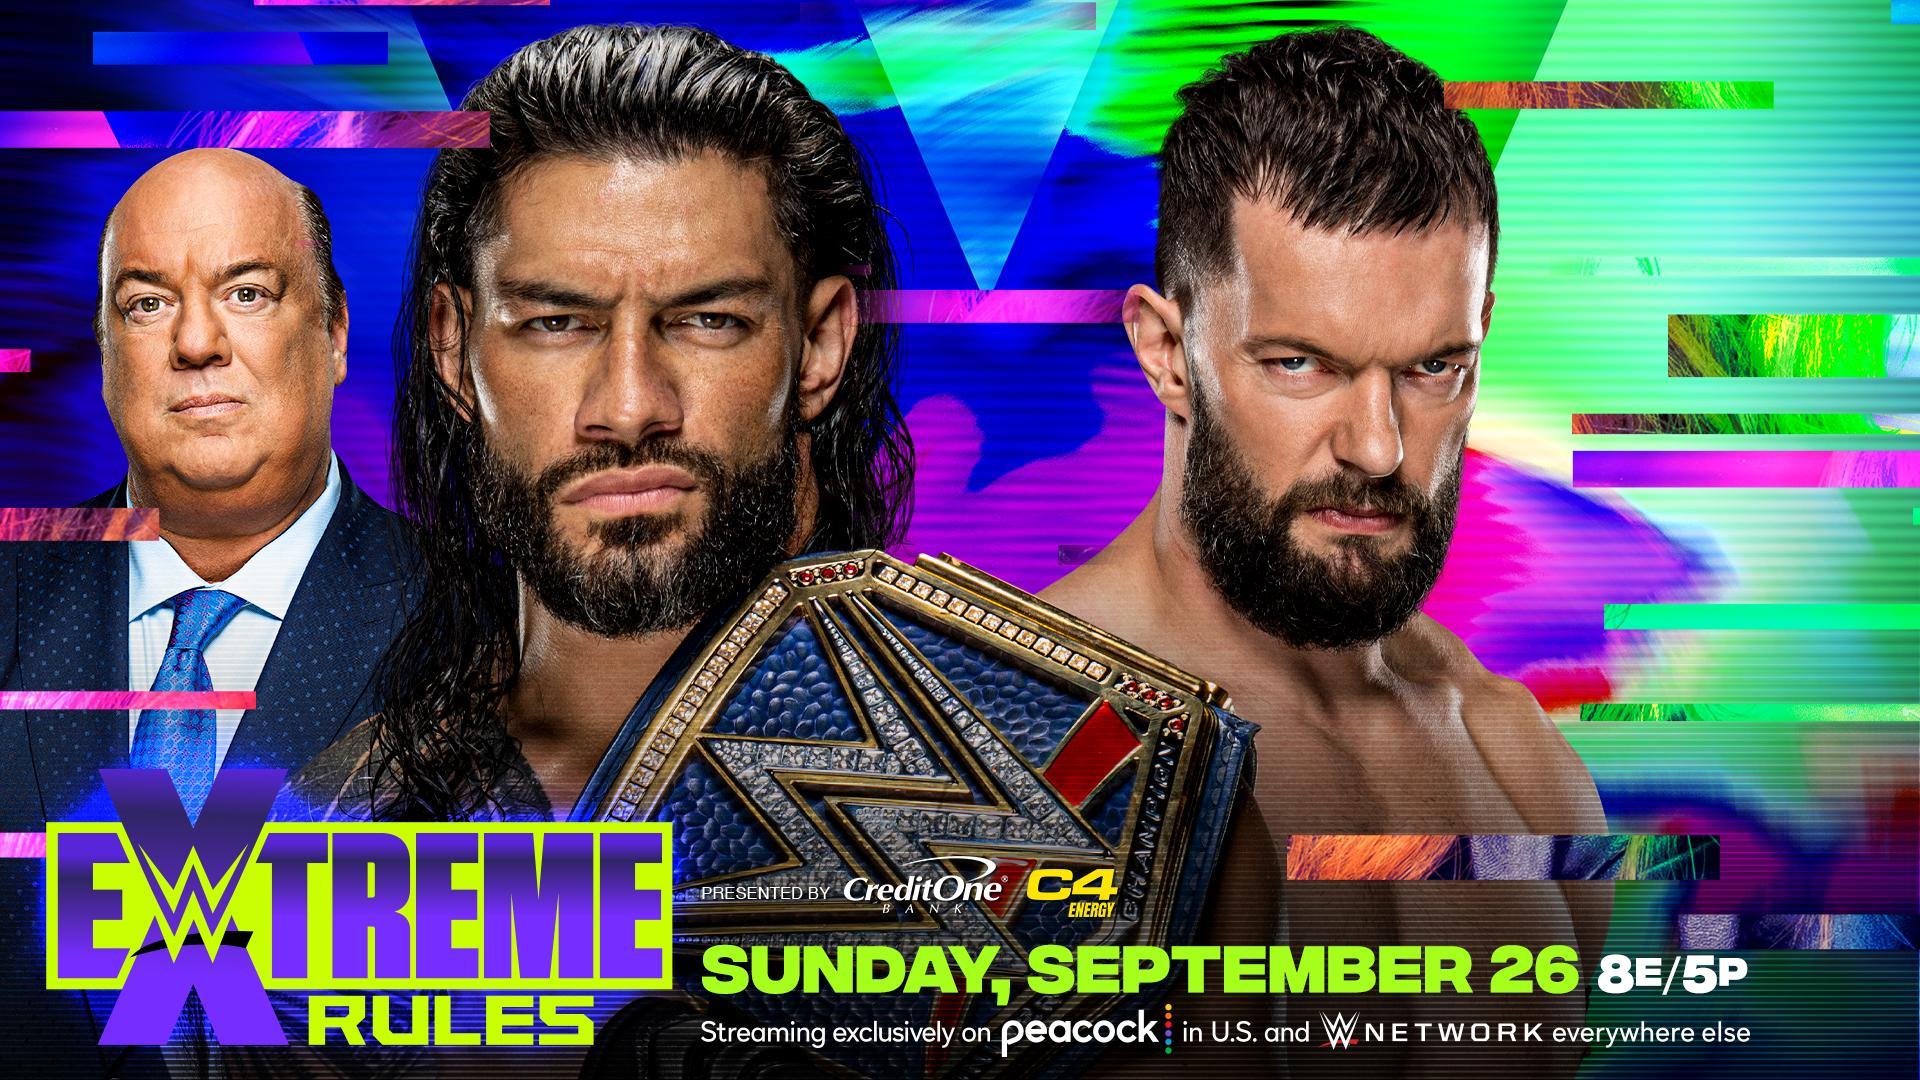 """Roman Reigns vs. Finn Bálor"" é anunciado para o WWE Extreme Rules"